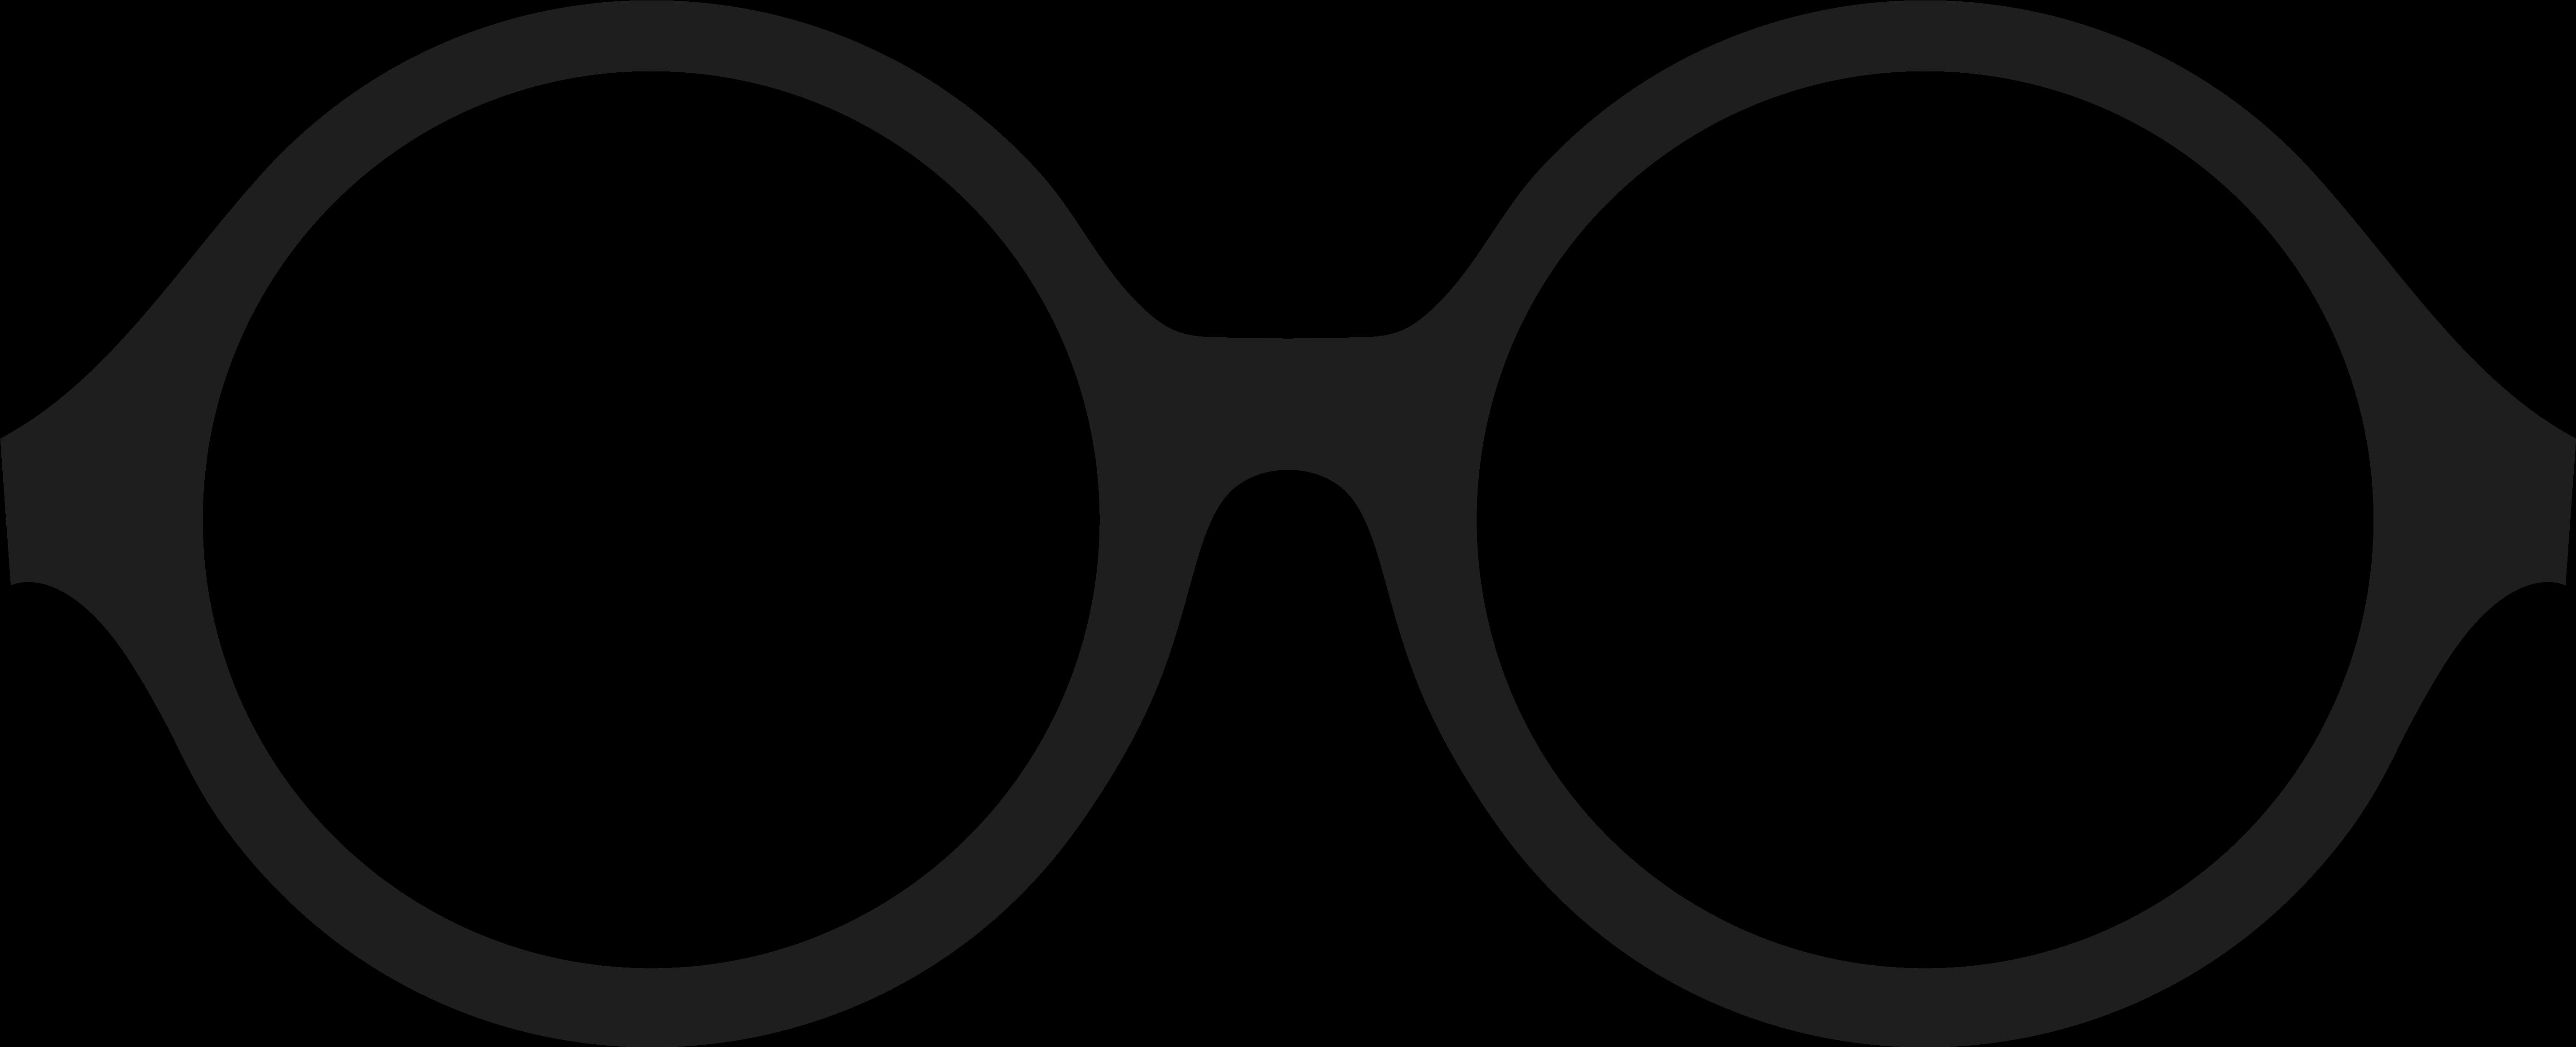 Eyeglasses clipart circle, Eyeglasses circle Transparent.